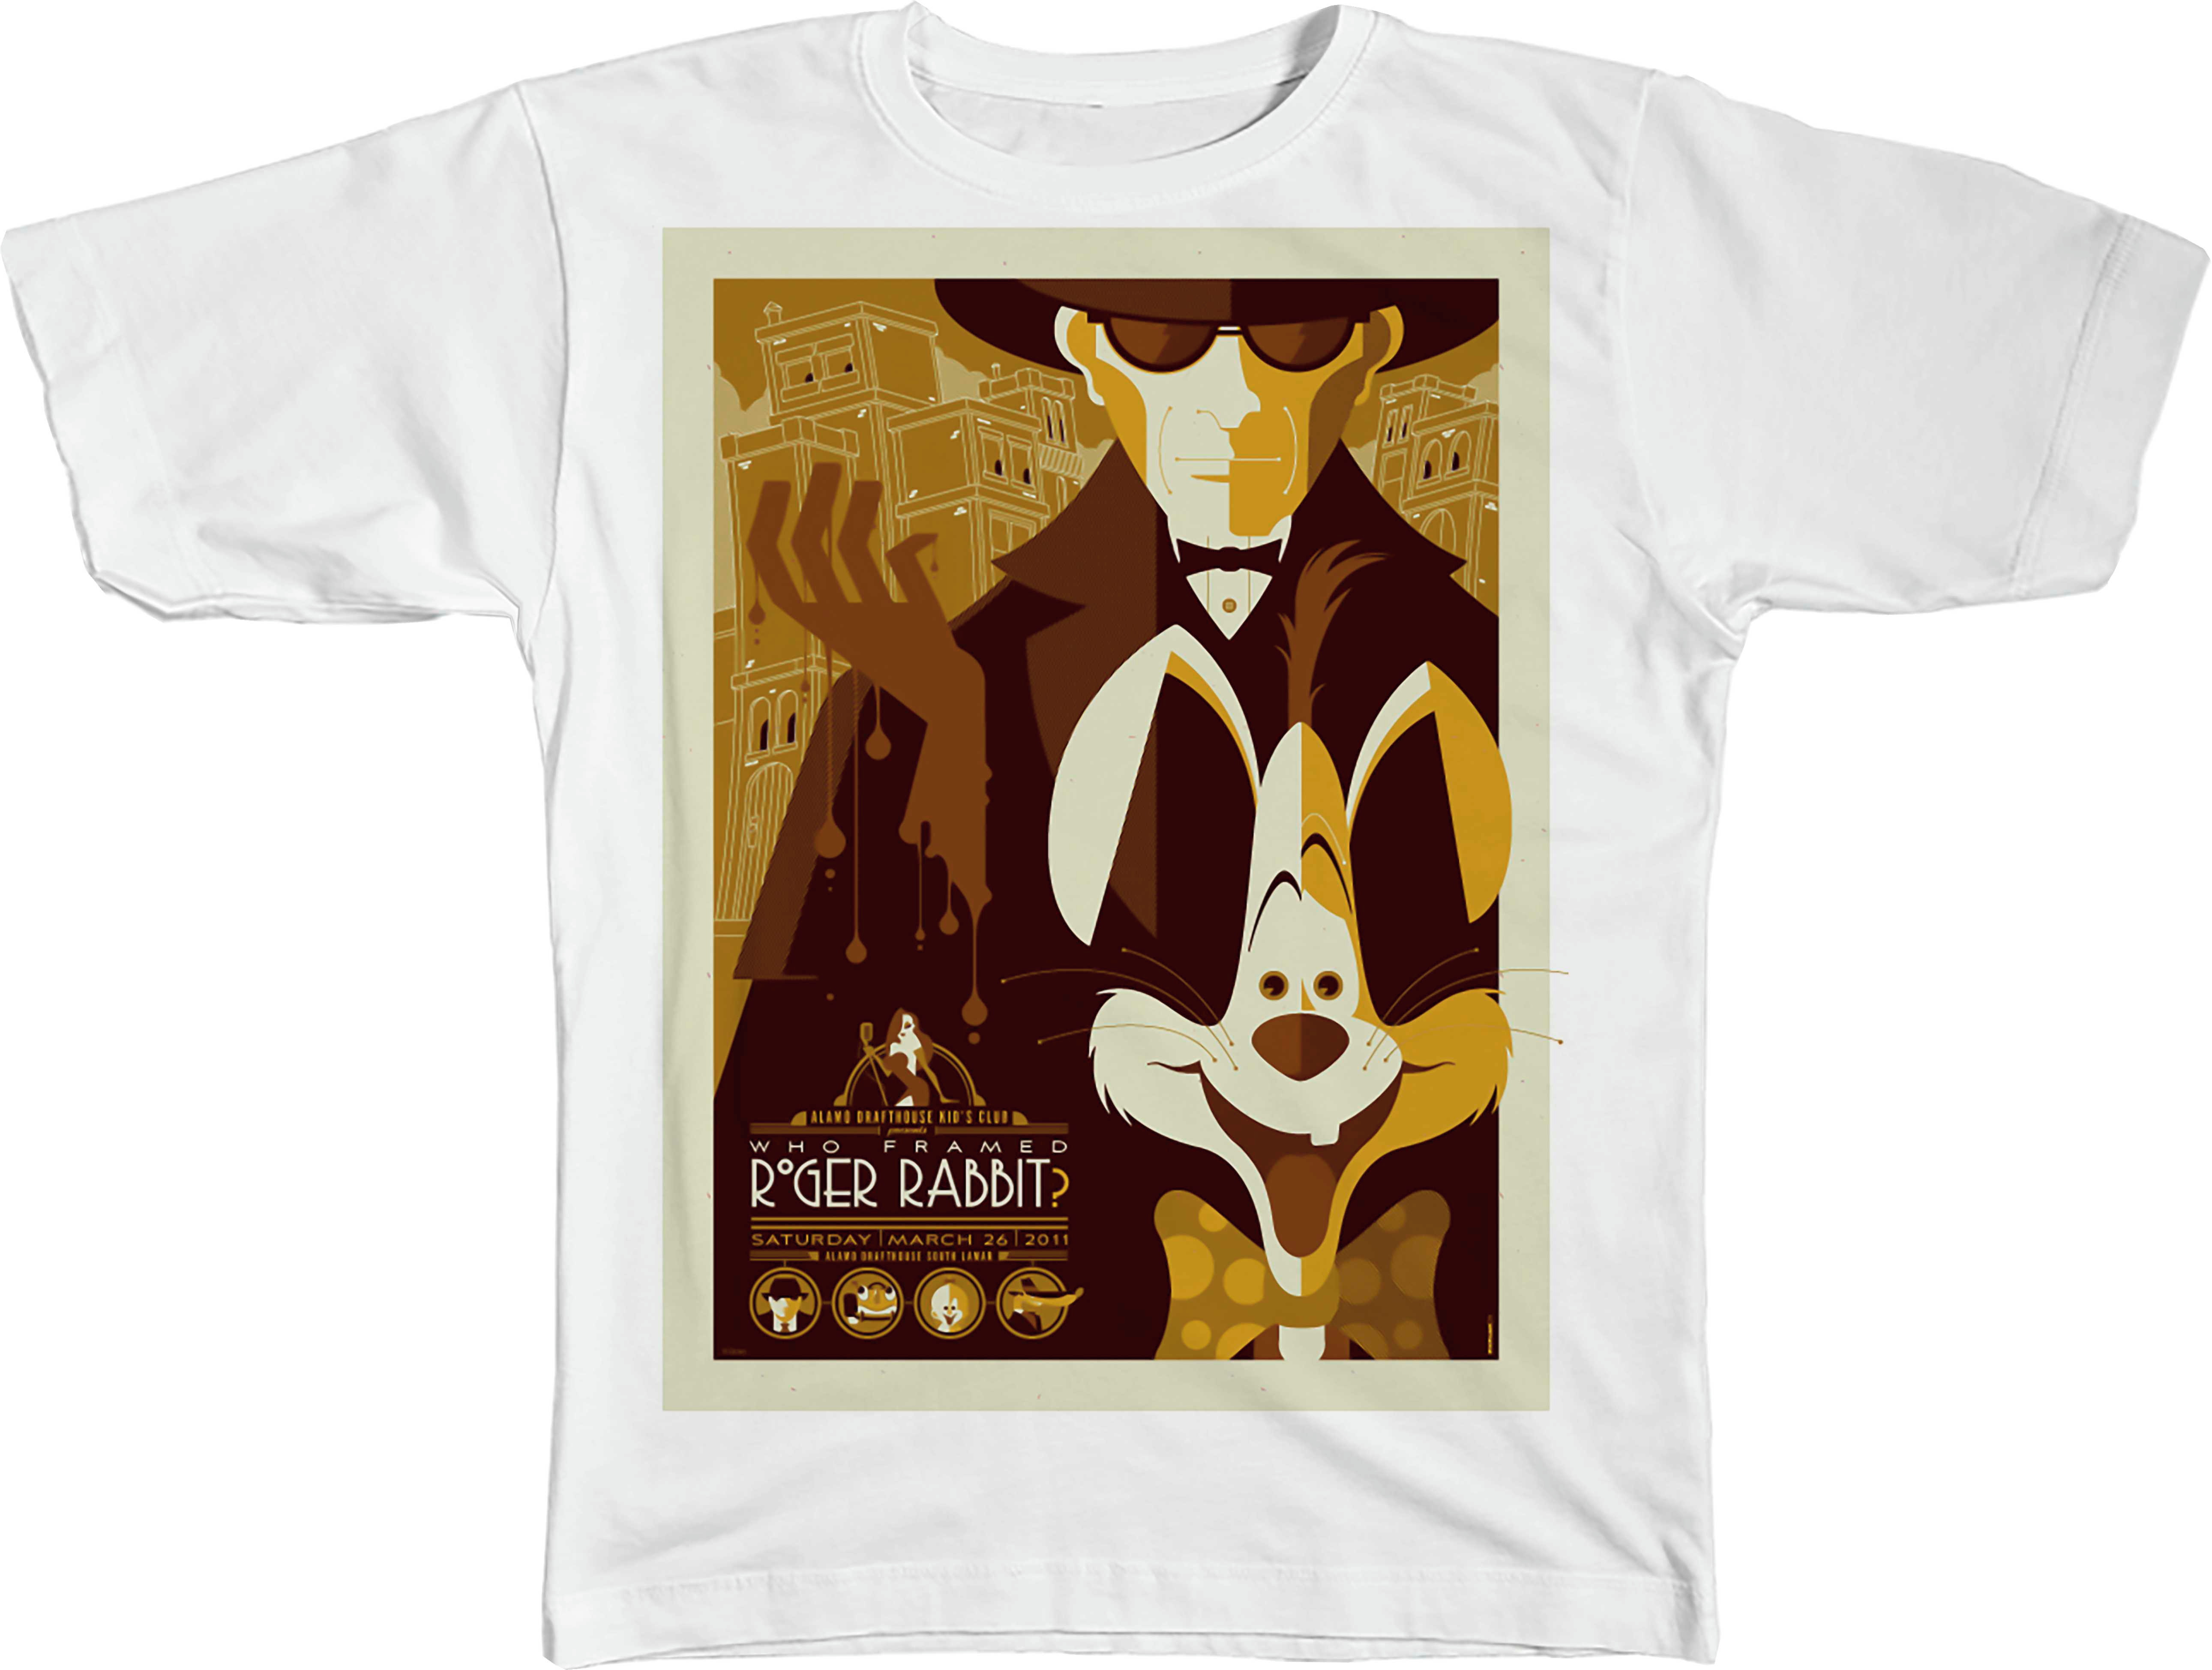 444a042c23 Camisa Camiseta Blusa Desenho Cartoon Show do Looney Tunes 1